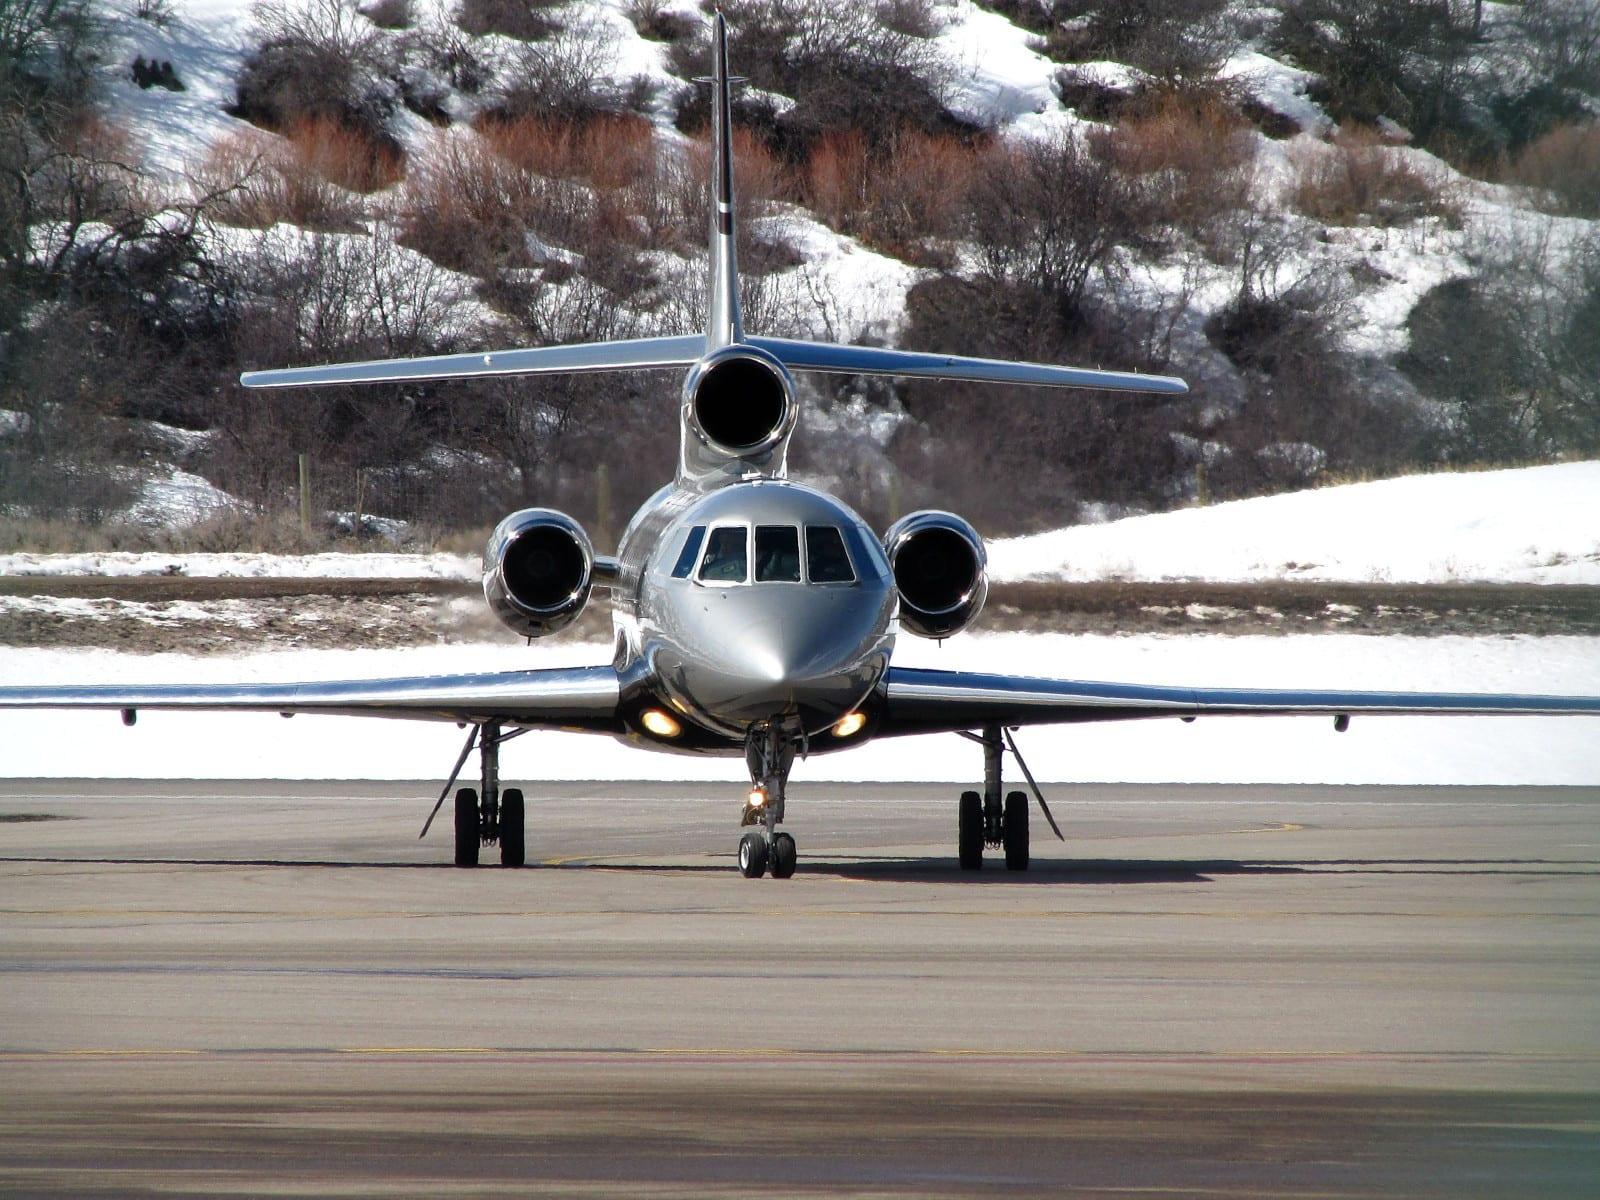 Aspen-Pitkin County Airport Dassault Falcon 50